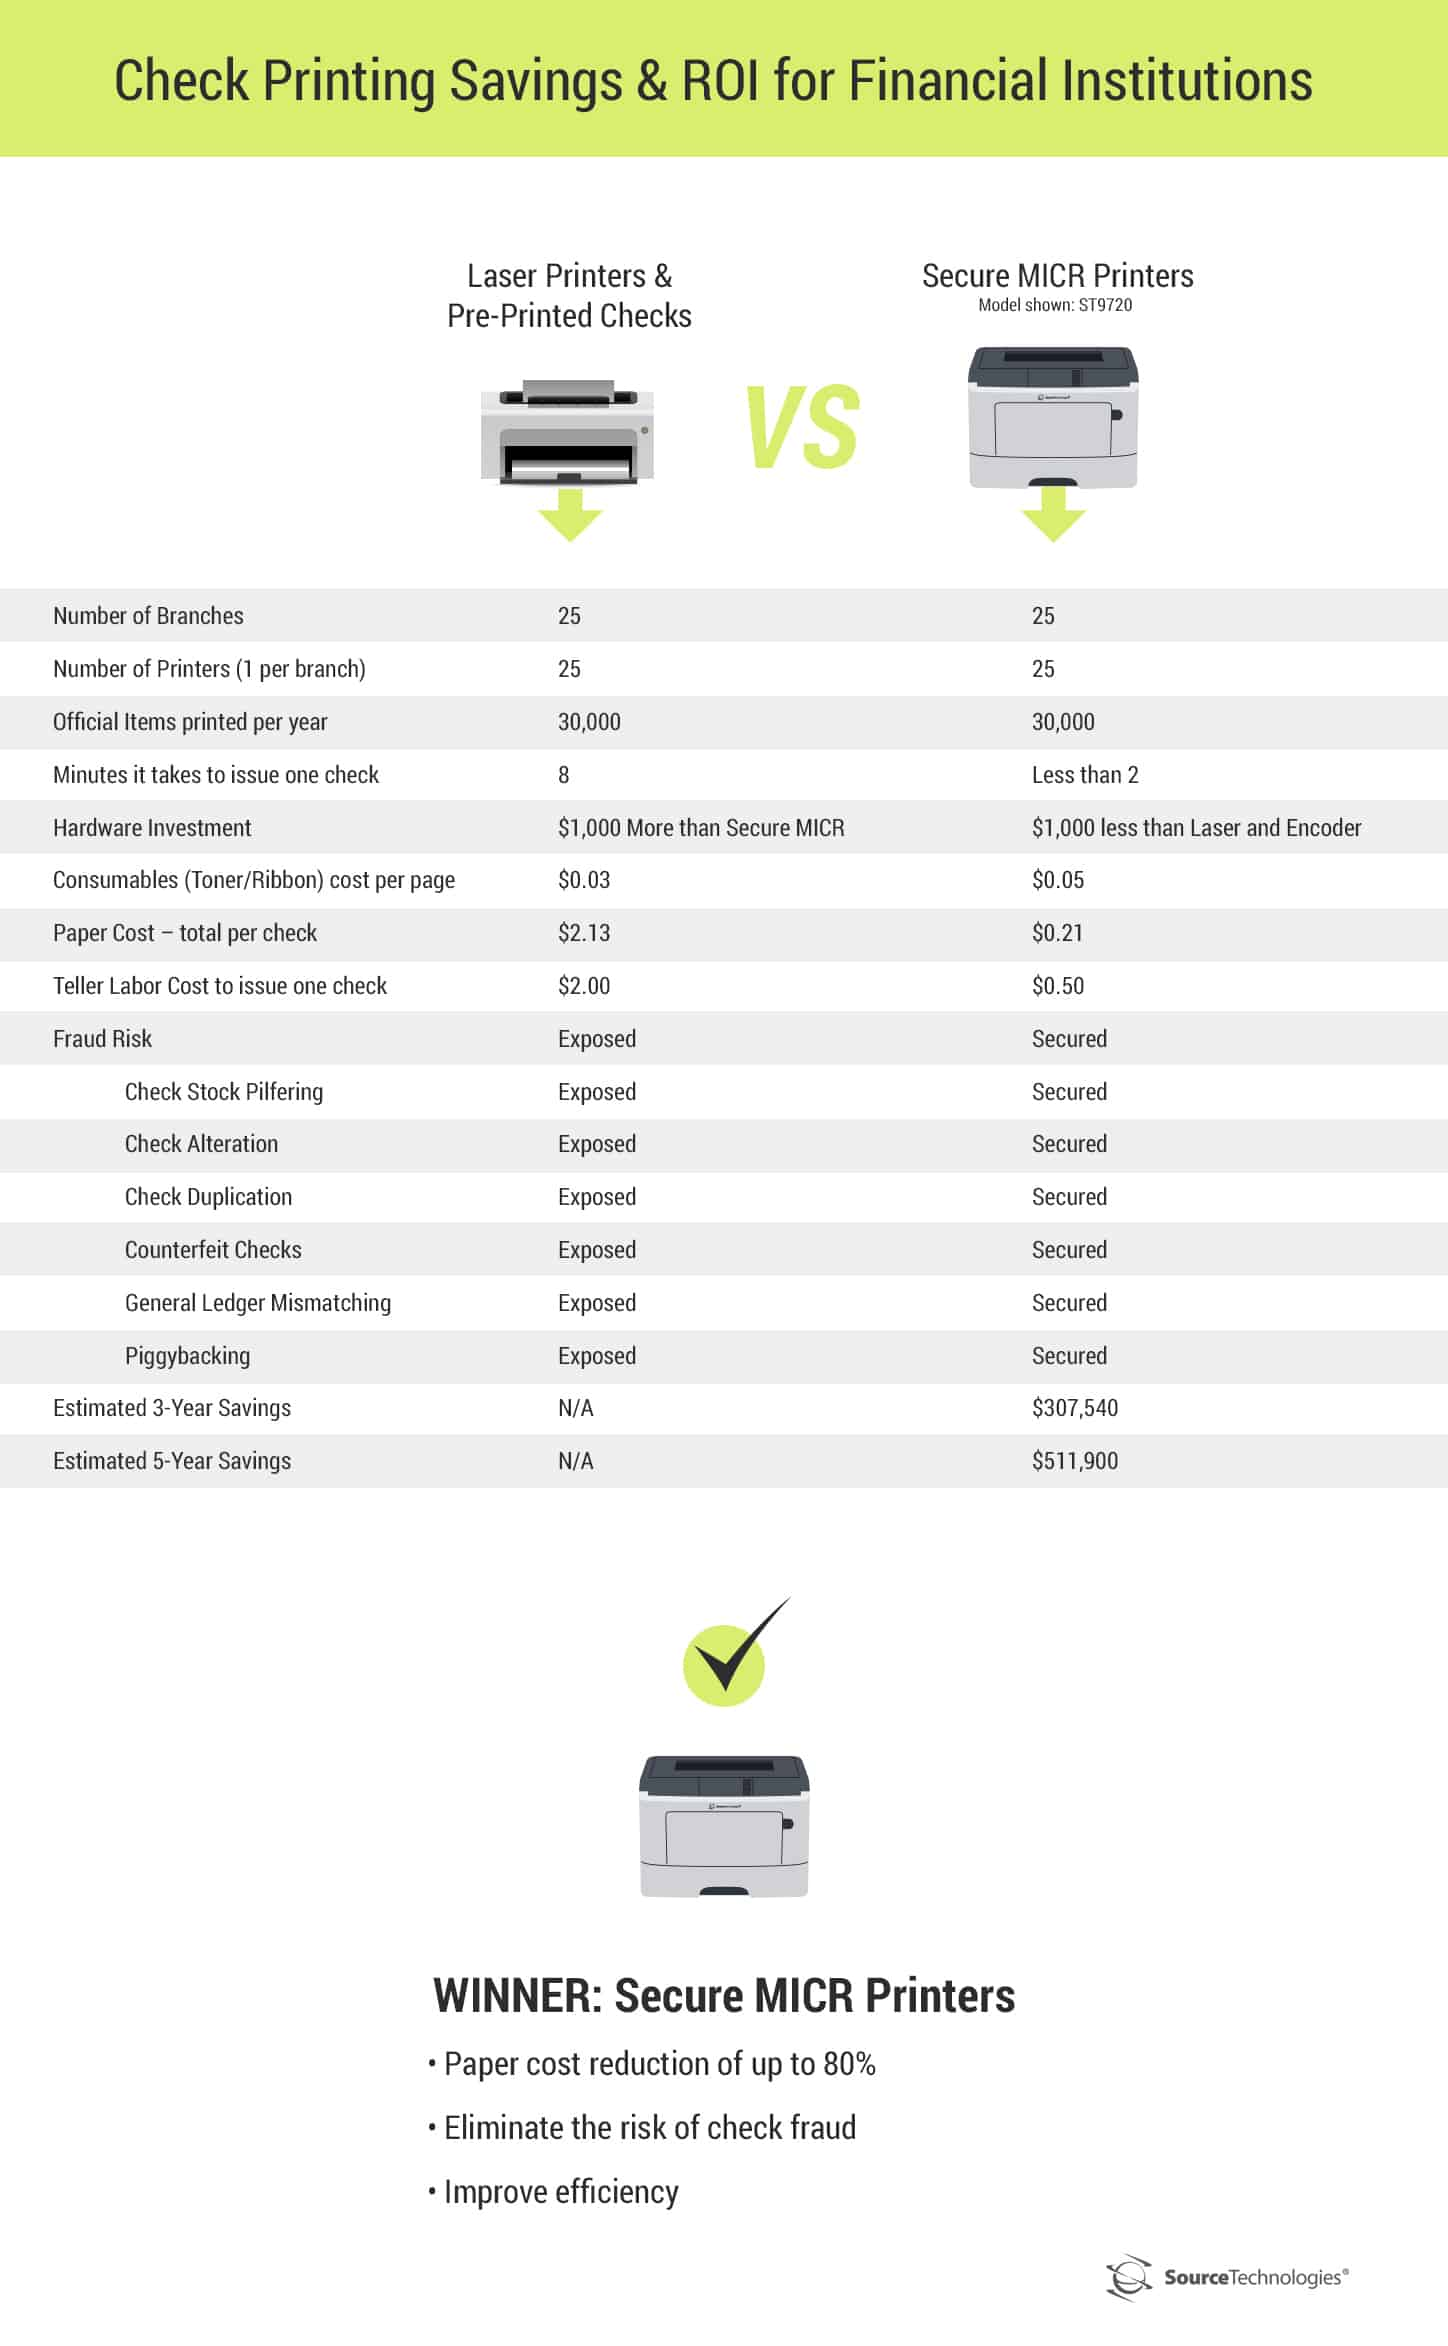 micr-printers-save-money